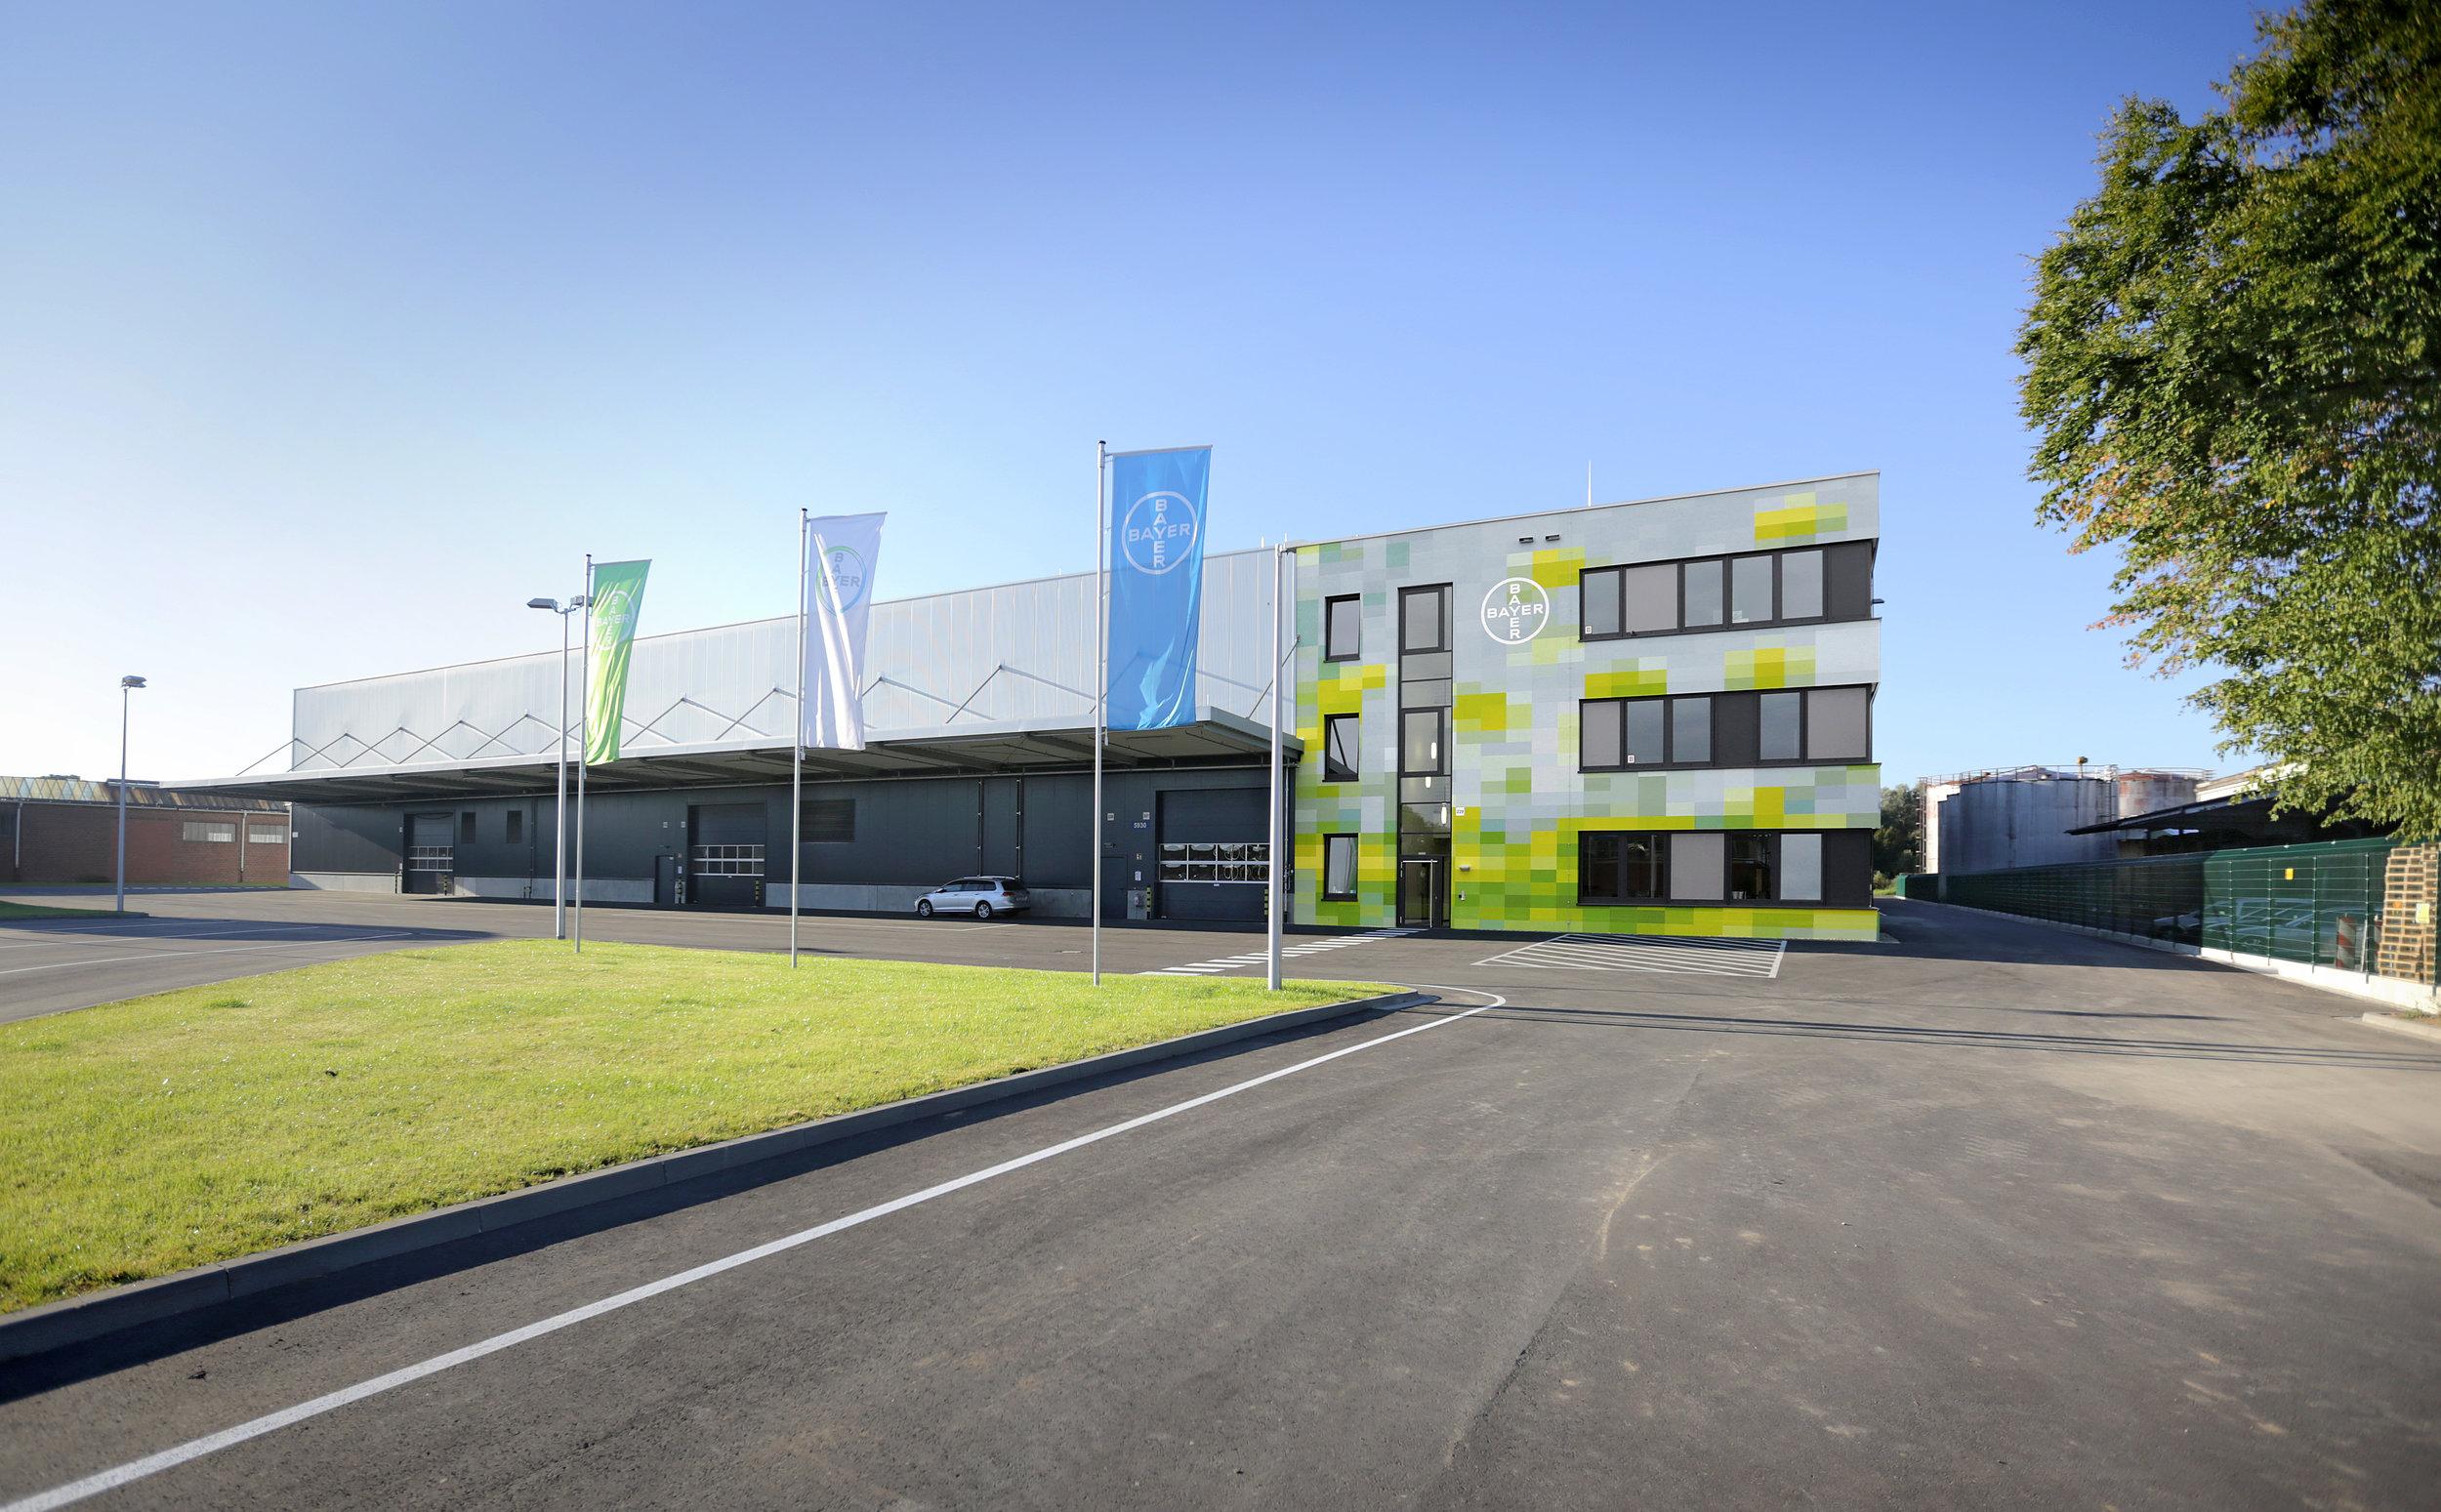 fassadengestaltung-produktionsgebäude-bayer-monheim